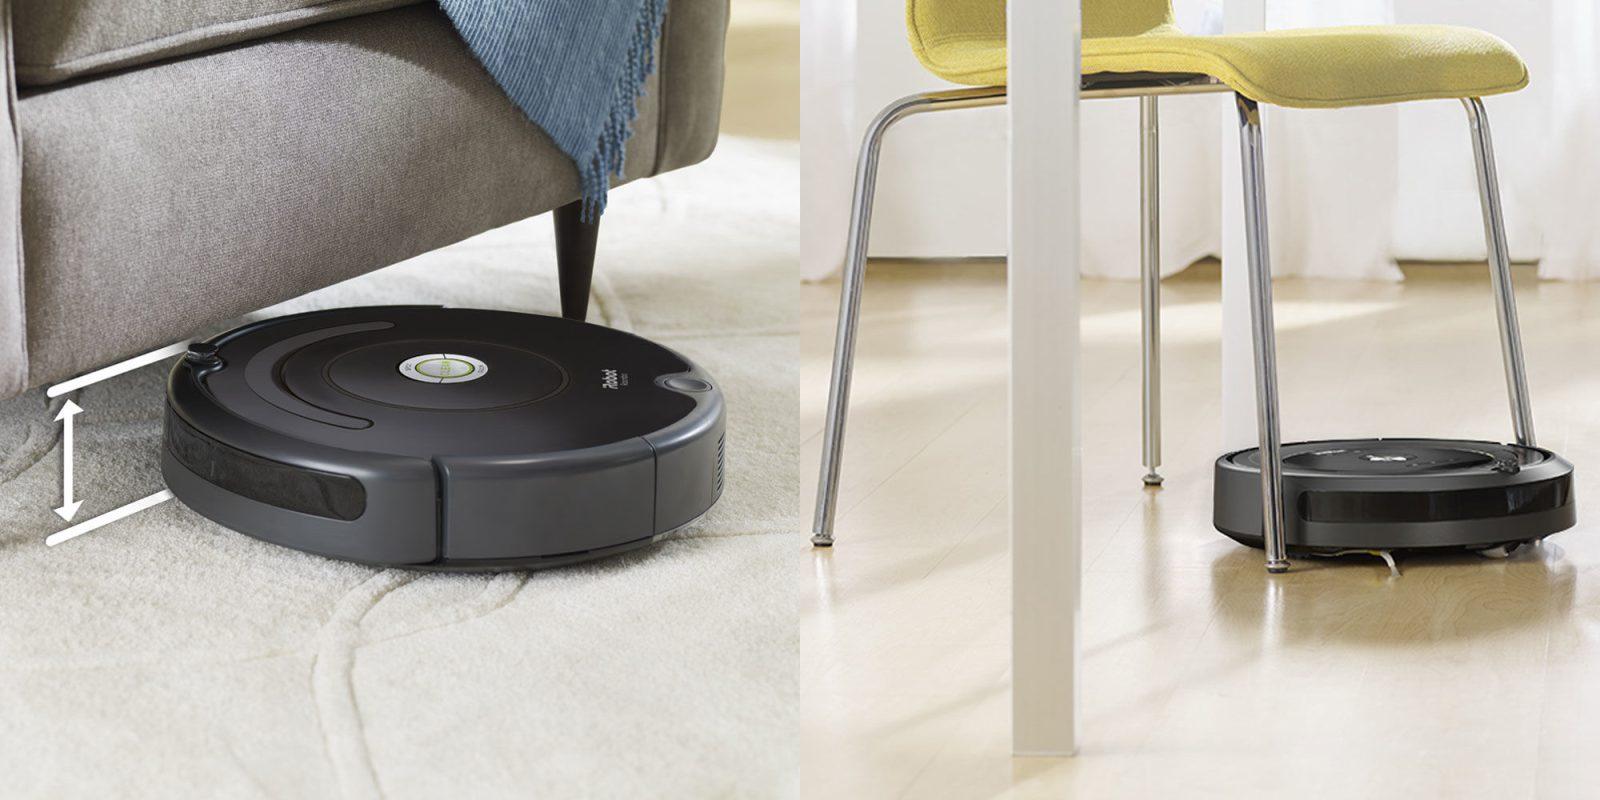 Add Irobot S Alexa Enabled Roomba 675 Robot Vacuum To Your